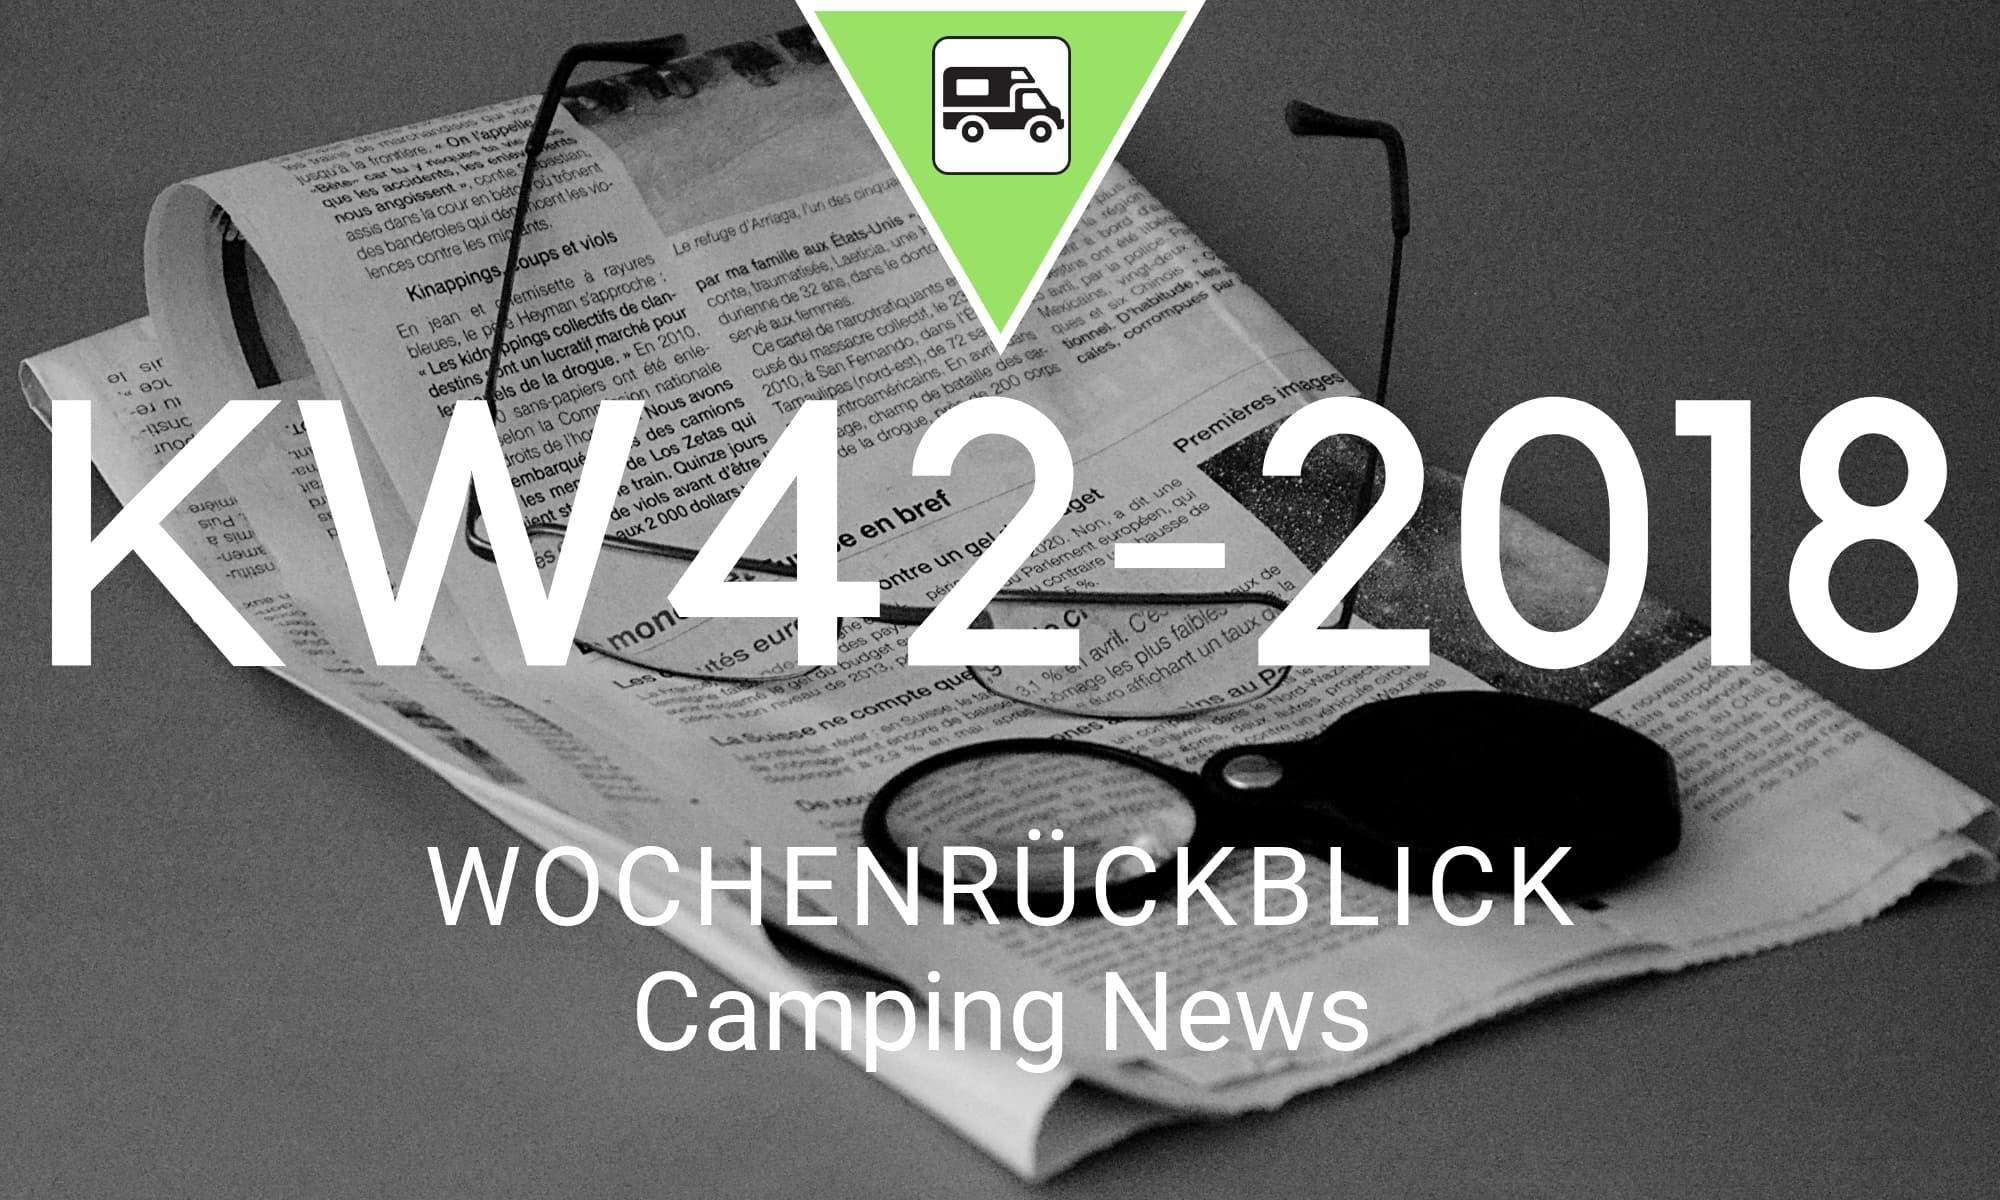 Wochenrückblick Camping News KW42-2018